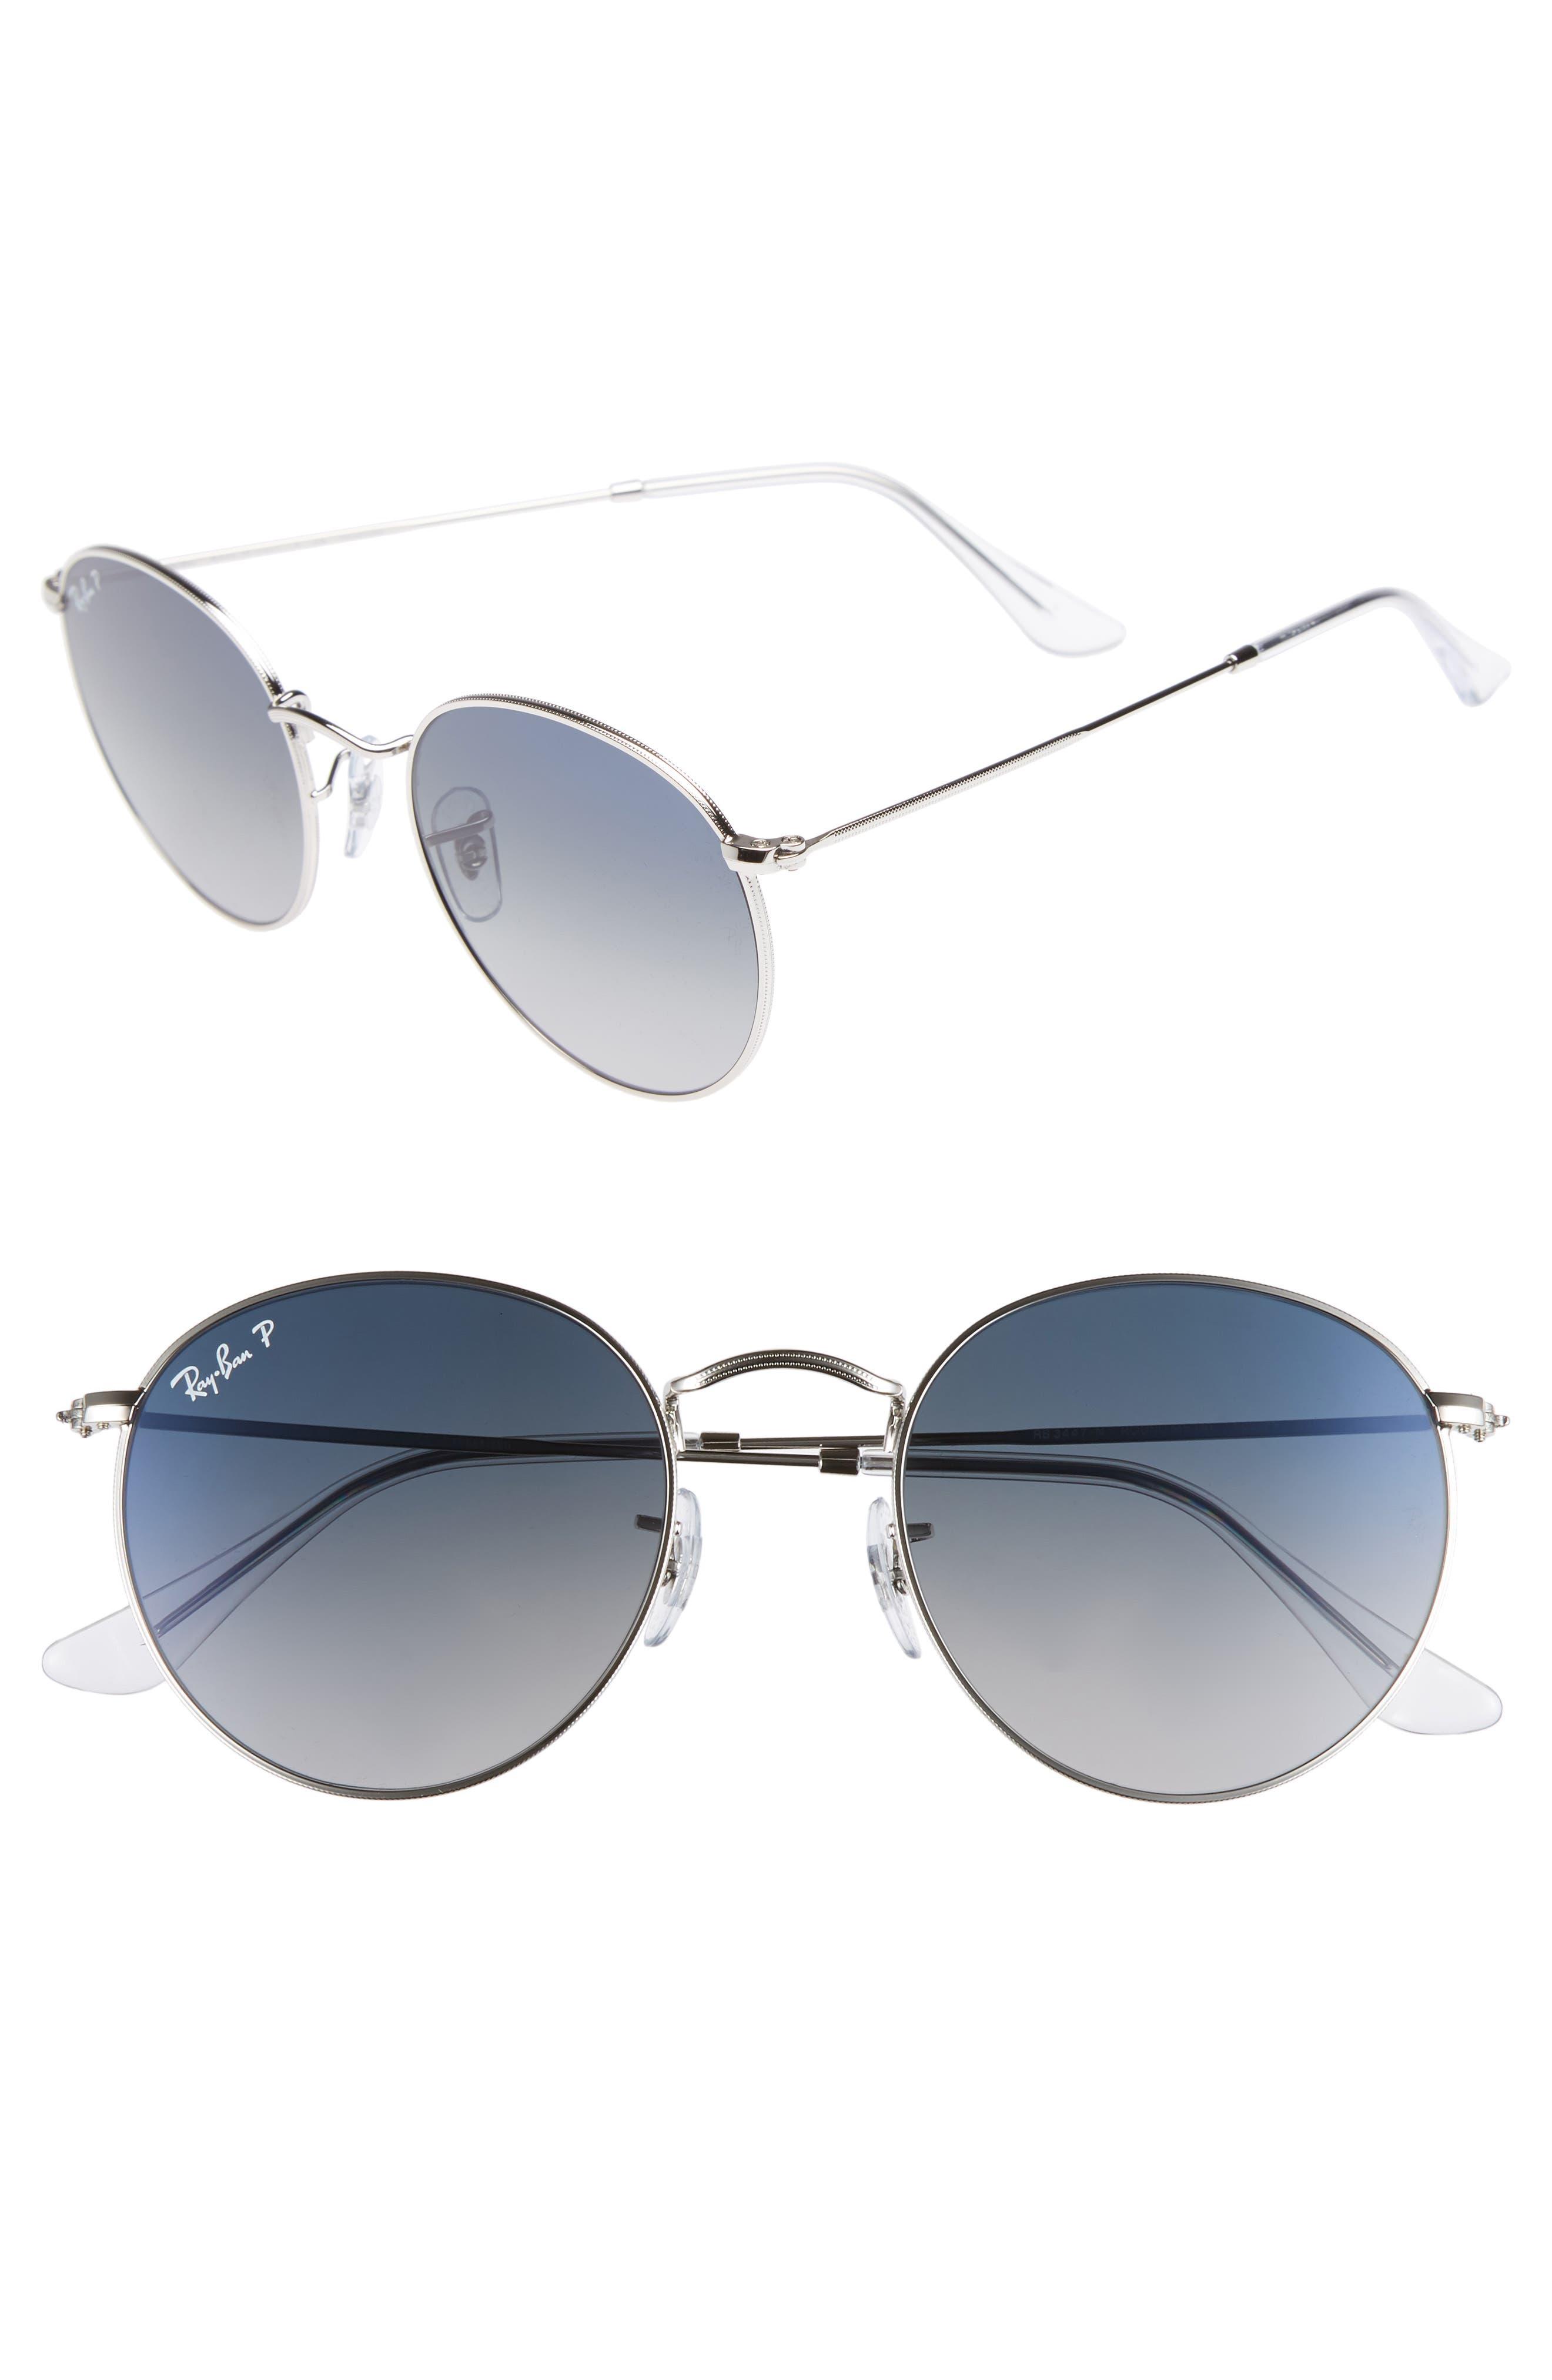 5ccb04606c ... best price ray ban 53mm polarized round sunglasses 1a941 c0db8